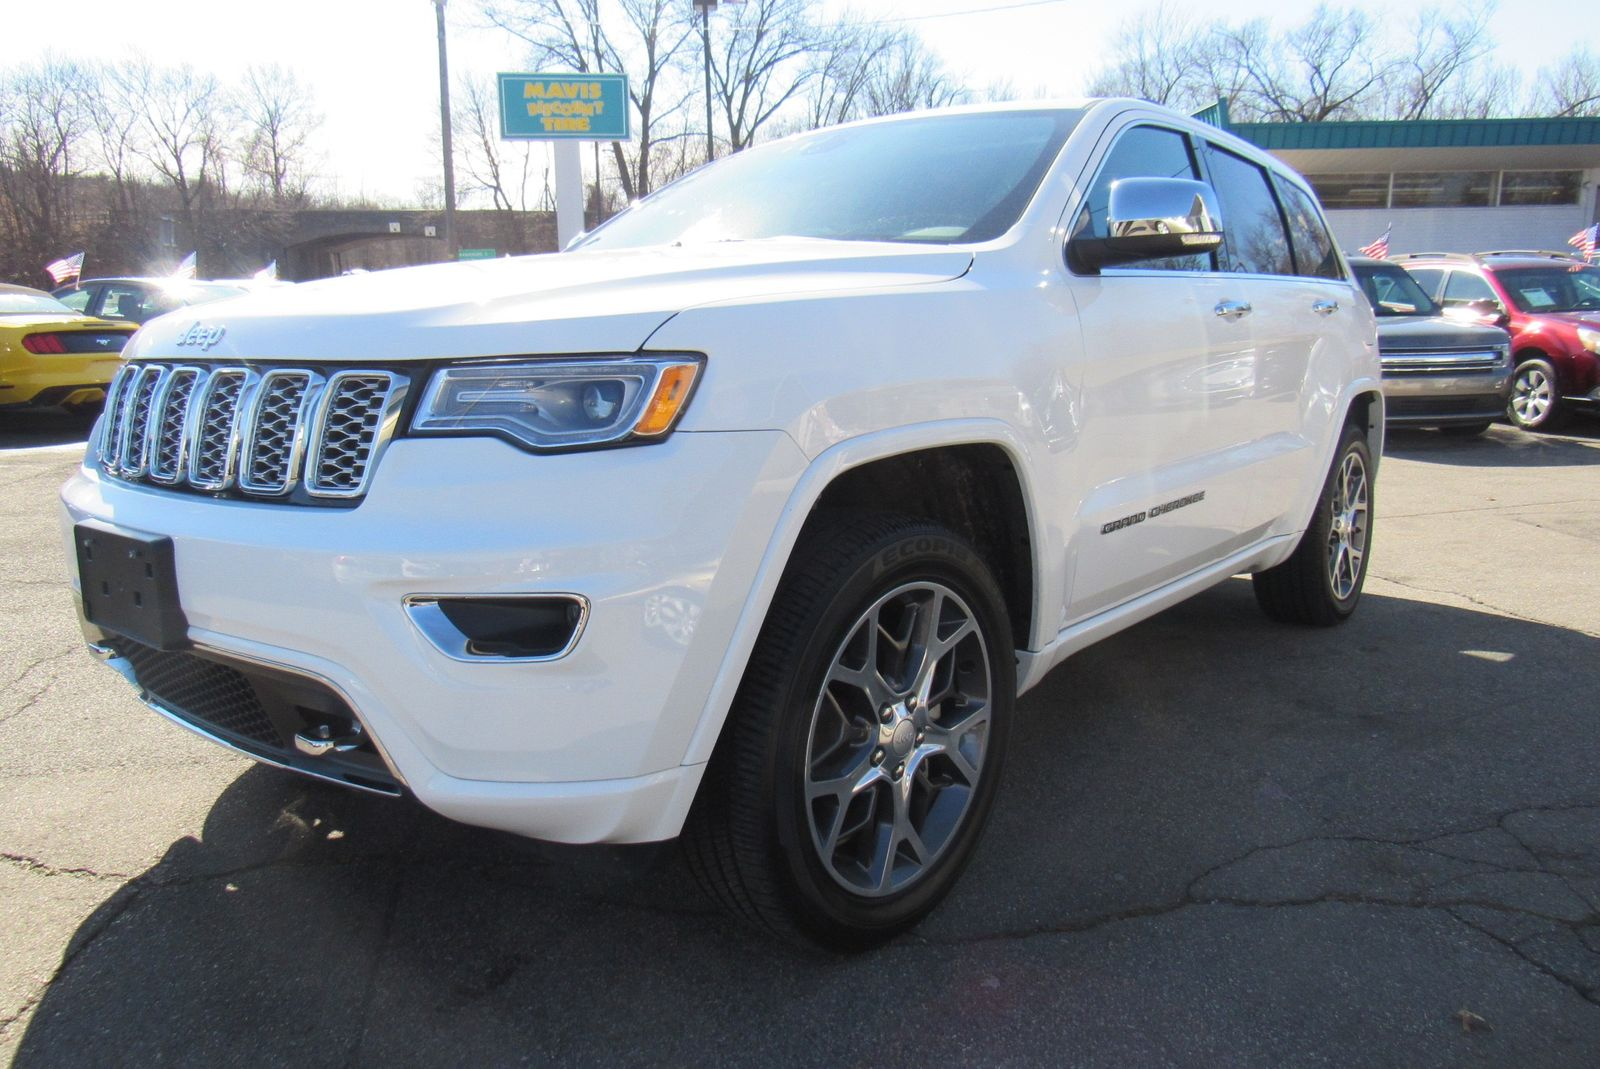 2019 Jeep Grand cherokee . Lot 999185710280 Vin 1C4RJFCG9KC579328